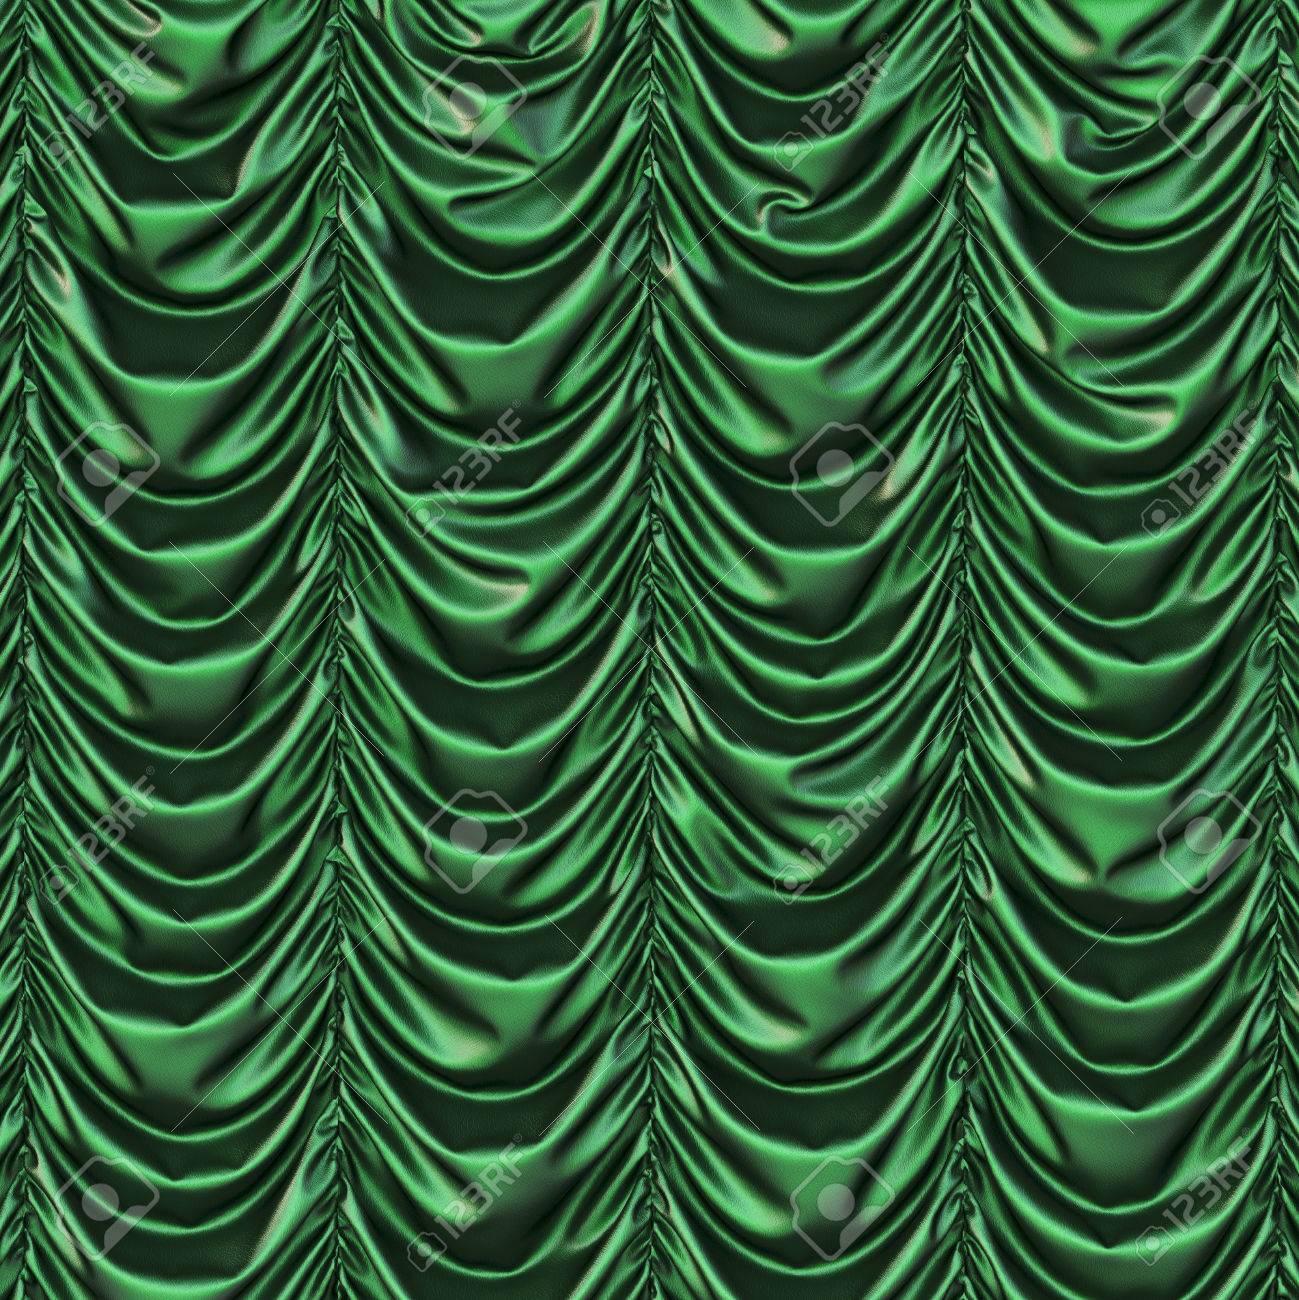 Theater Green Curtains Presentation Banco De Imagens